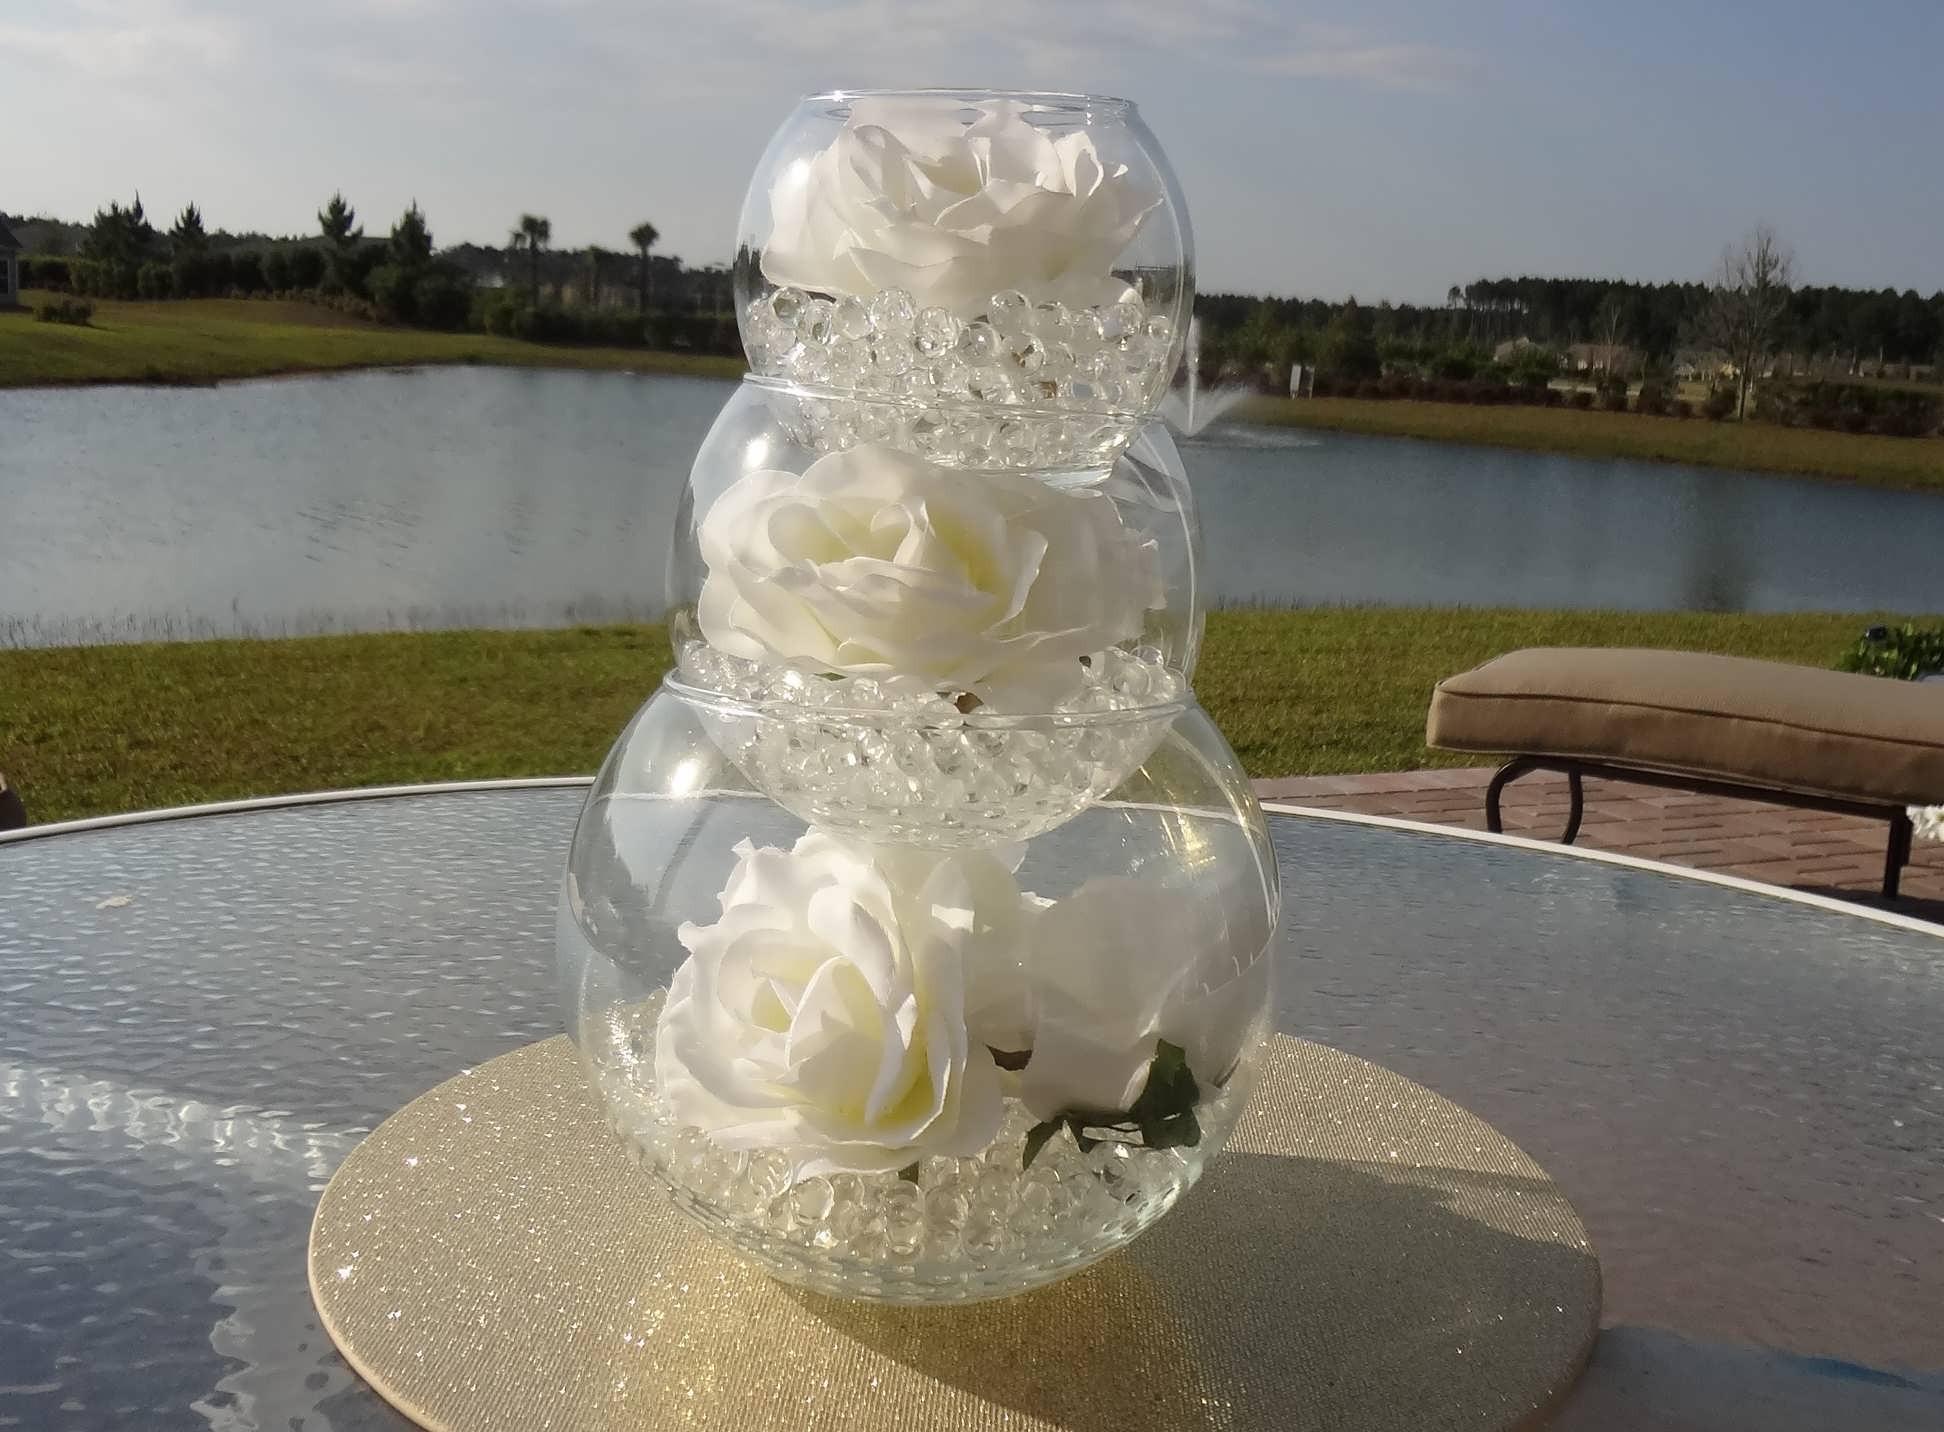 Best ideas about DIY Wedding Centerpieces Without Flowers . Save or Pin Best Ideas Centerpieces For Weddings Now.